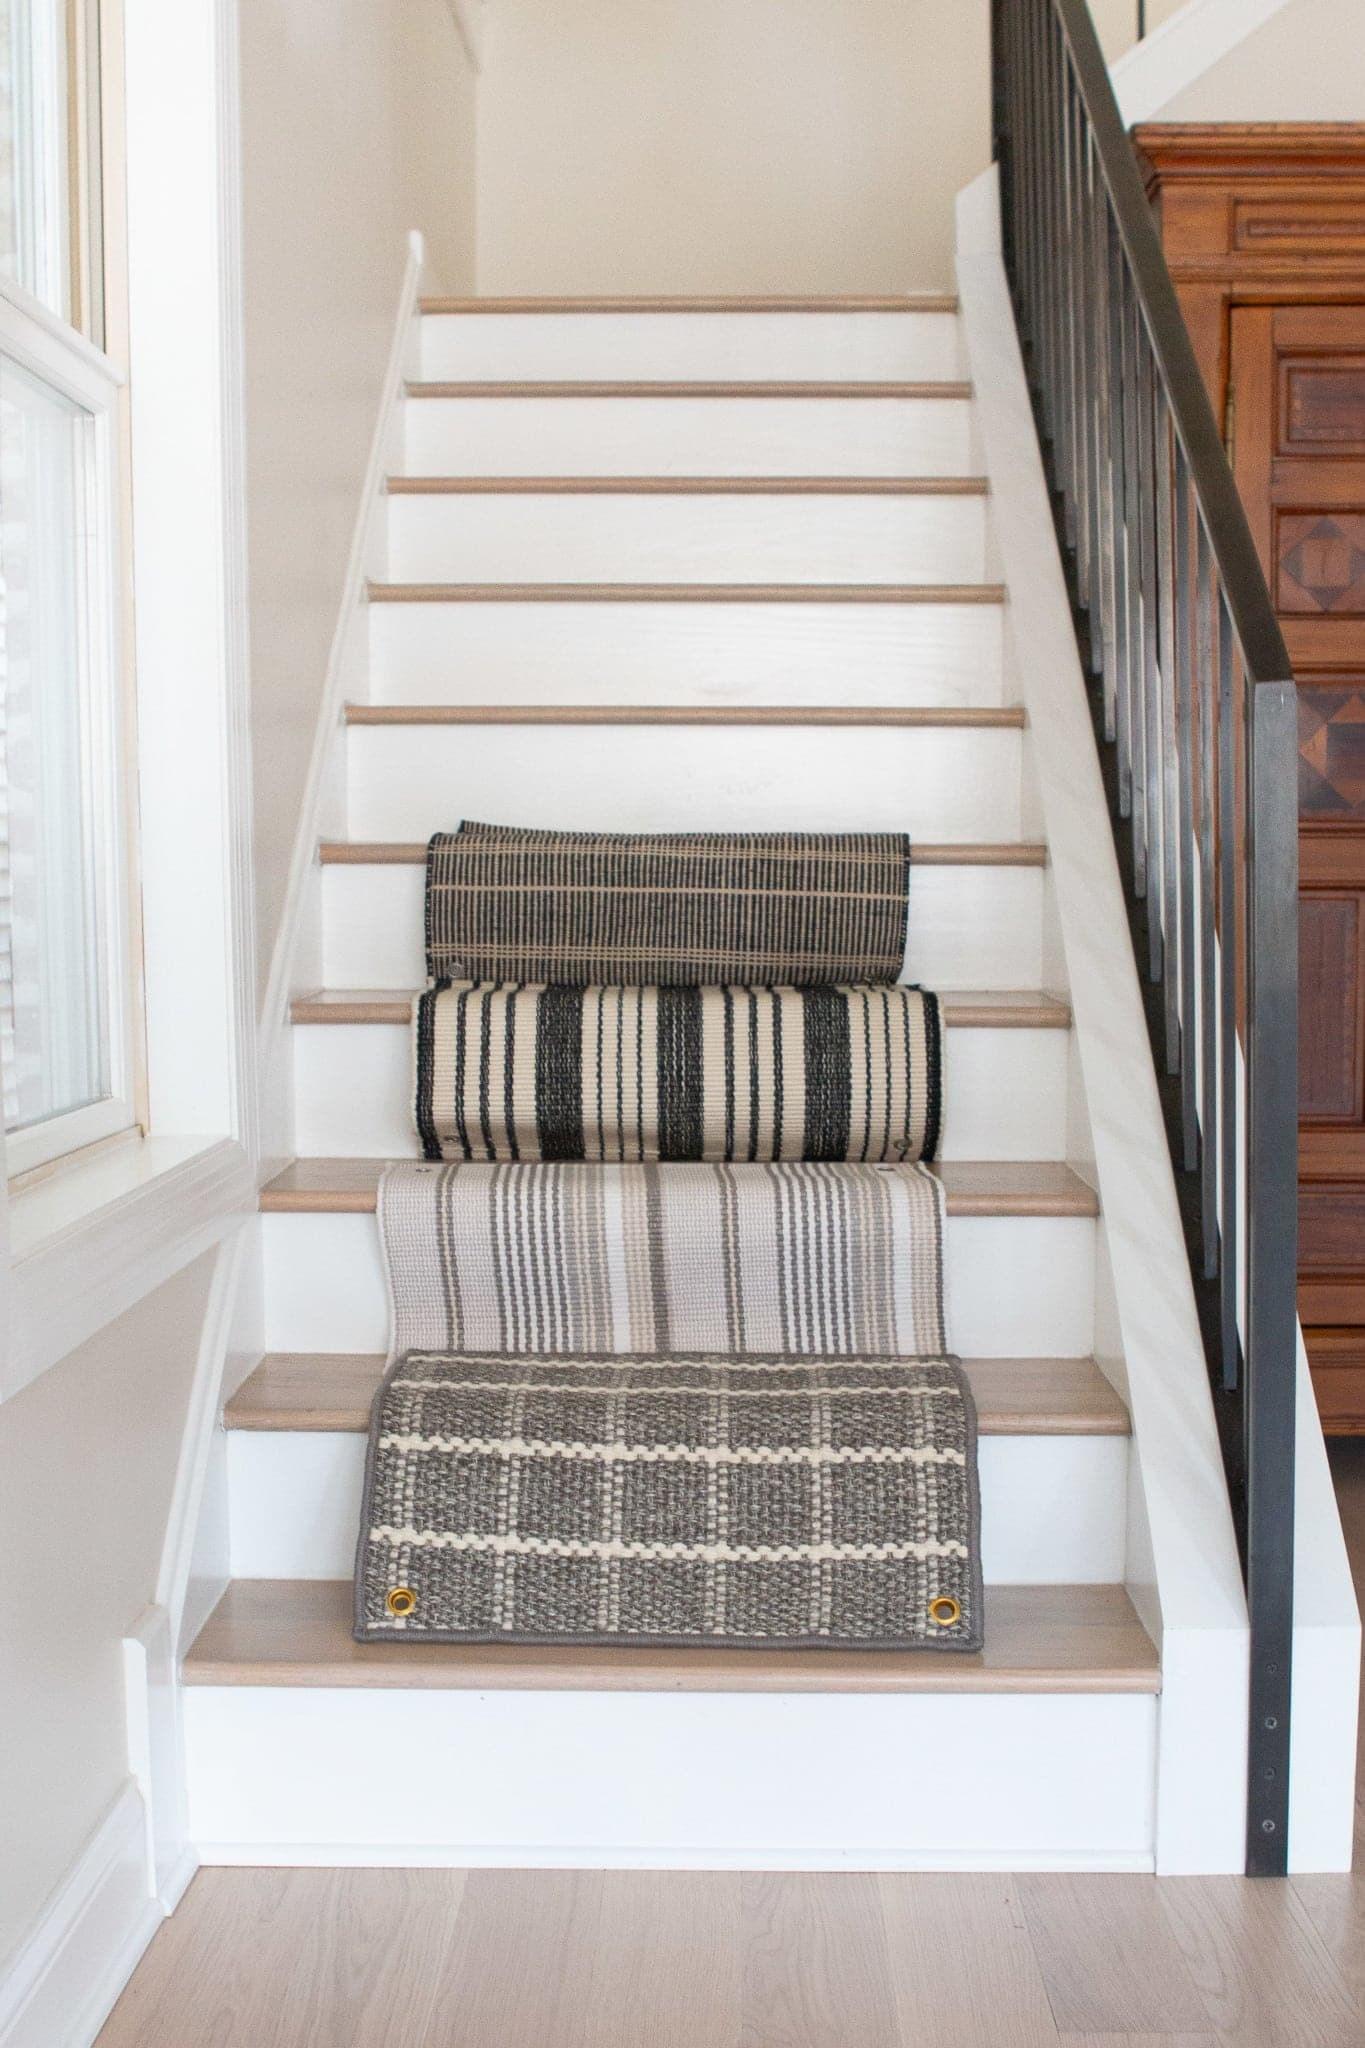 How To Install A Stair Runner On Hardwoods The Diy Playbook | Roll Runners For Stairs | Carpet Stair Treads | Kurdamir | Area Rugs | Flooring | Carpet Runner